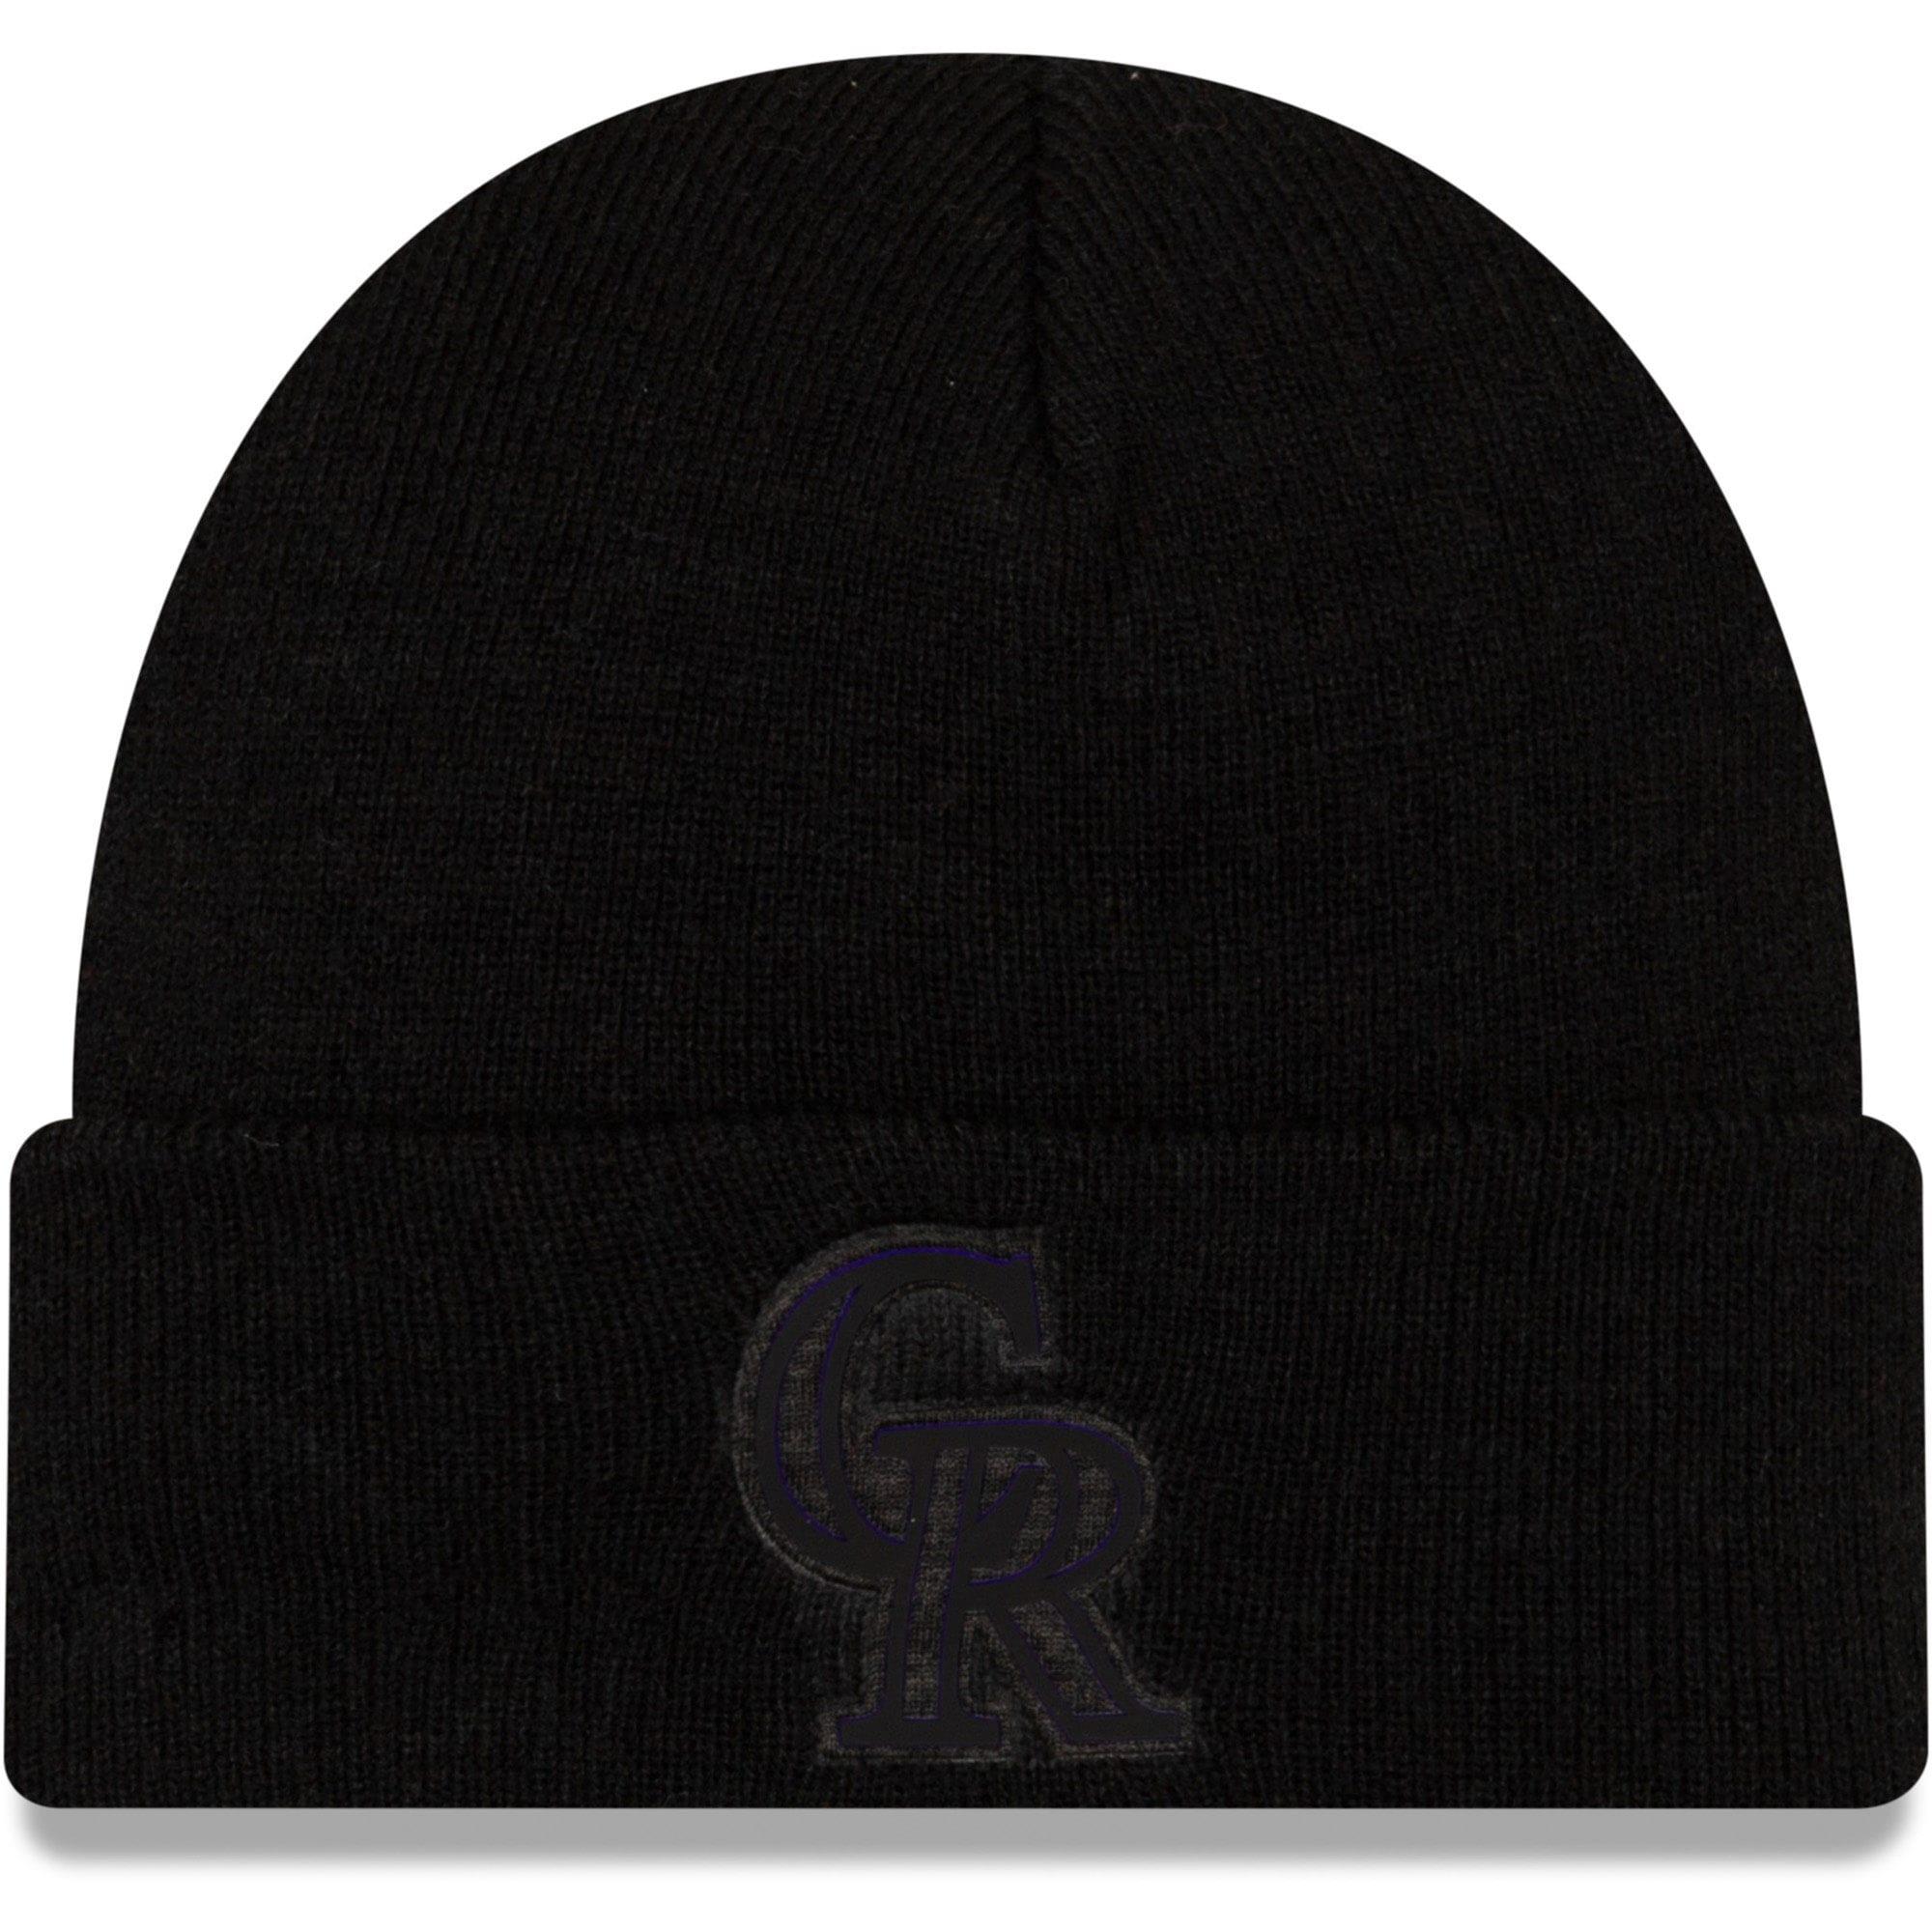 Colorado Rockies New Era Vivid Cuffed Knit Hat - Black